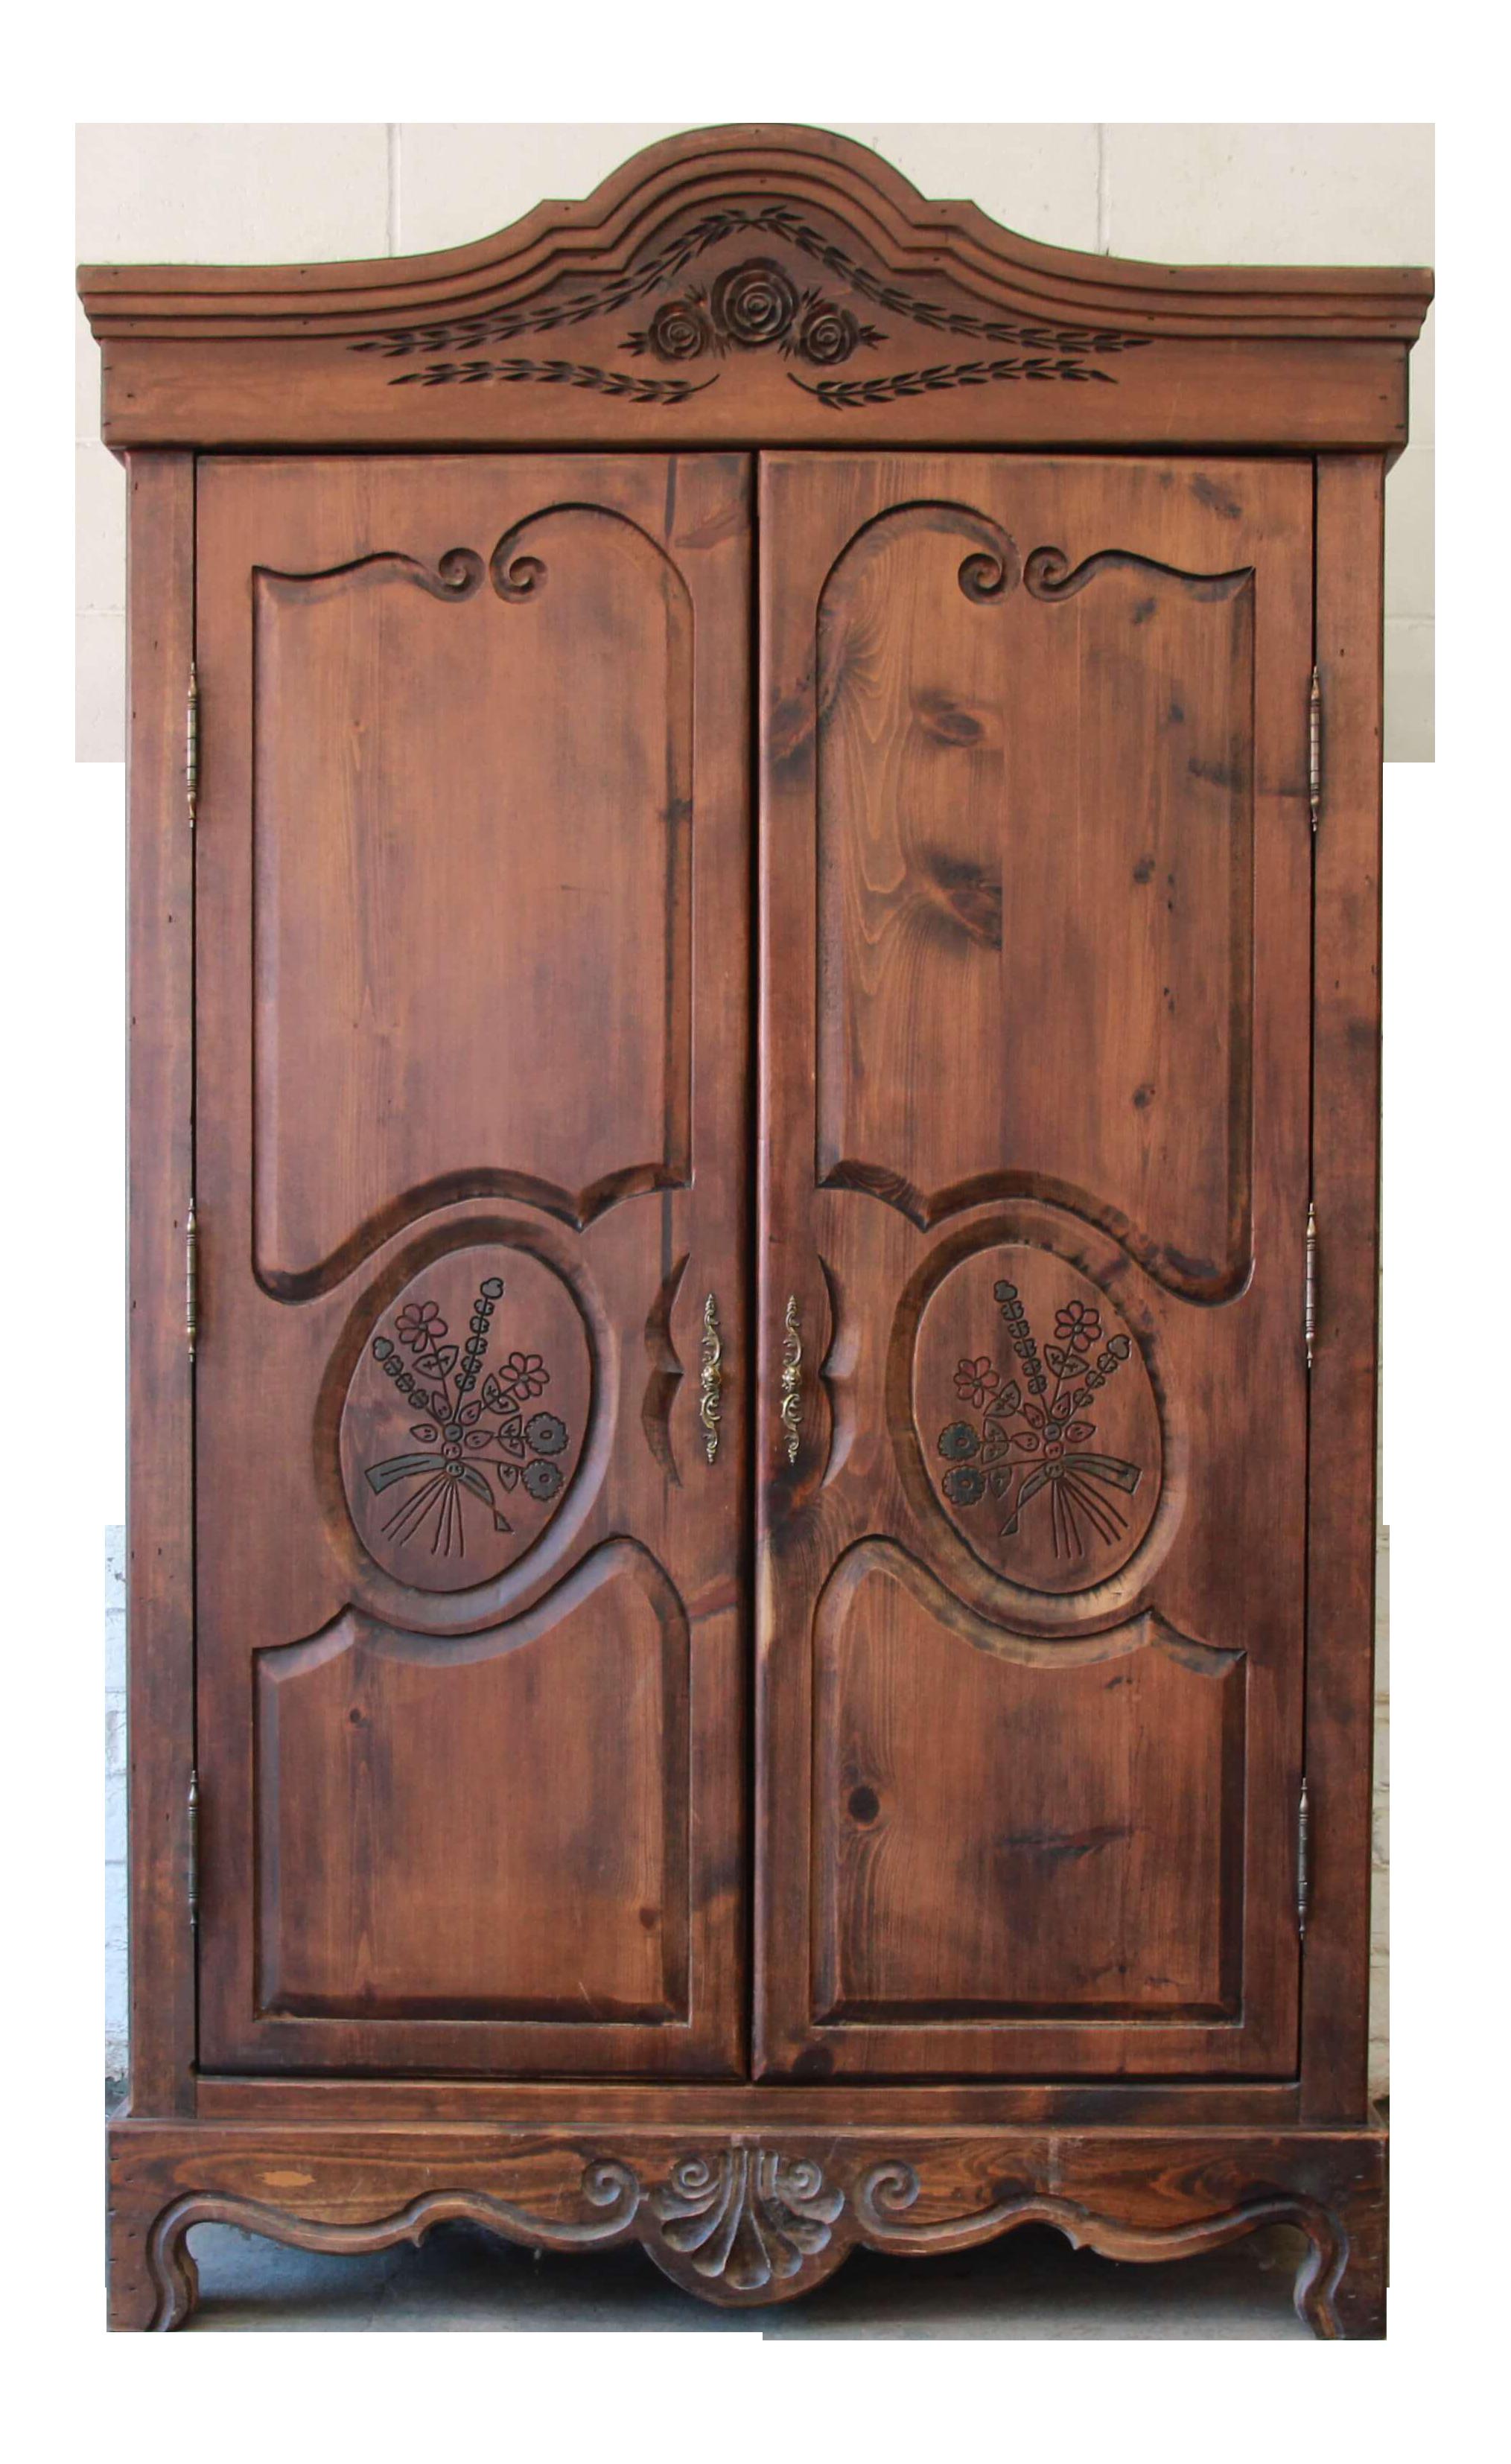 vintage habersham plantation furniture Vintage French Country Spoon Carved Dark Pine Wardrobe by  vintage habersham plantation furniture